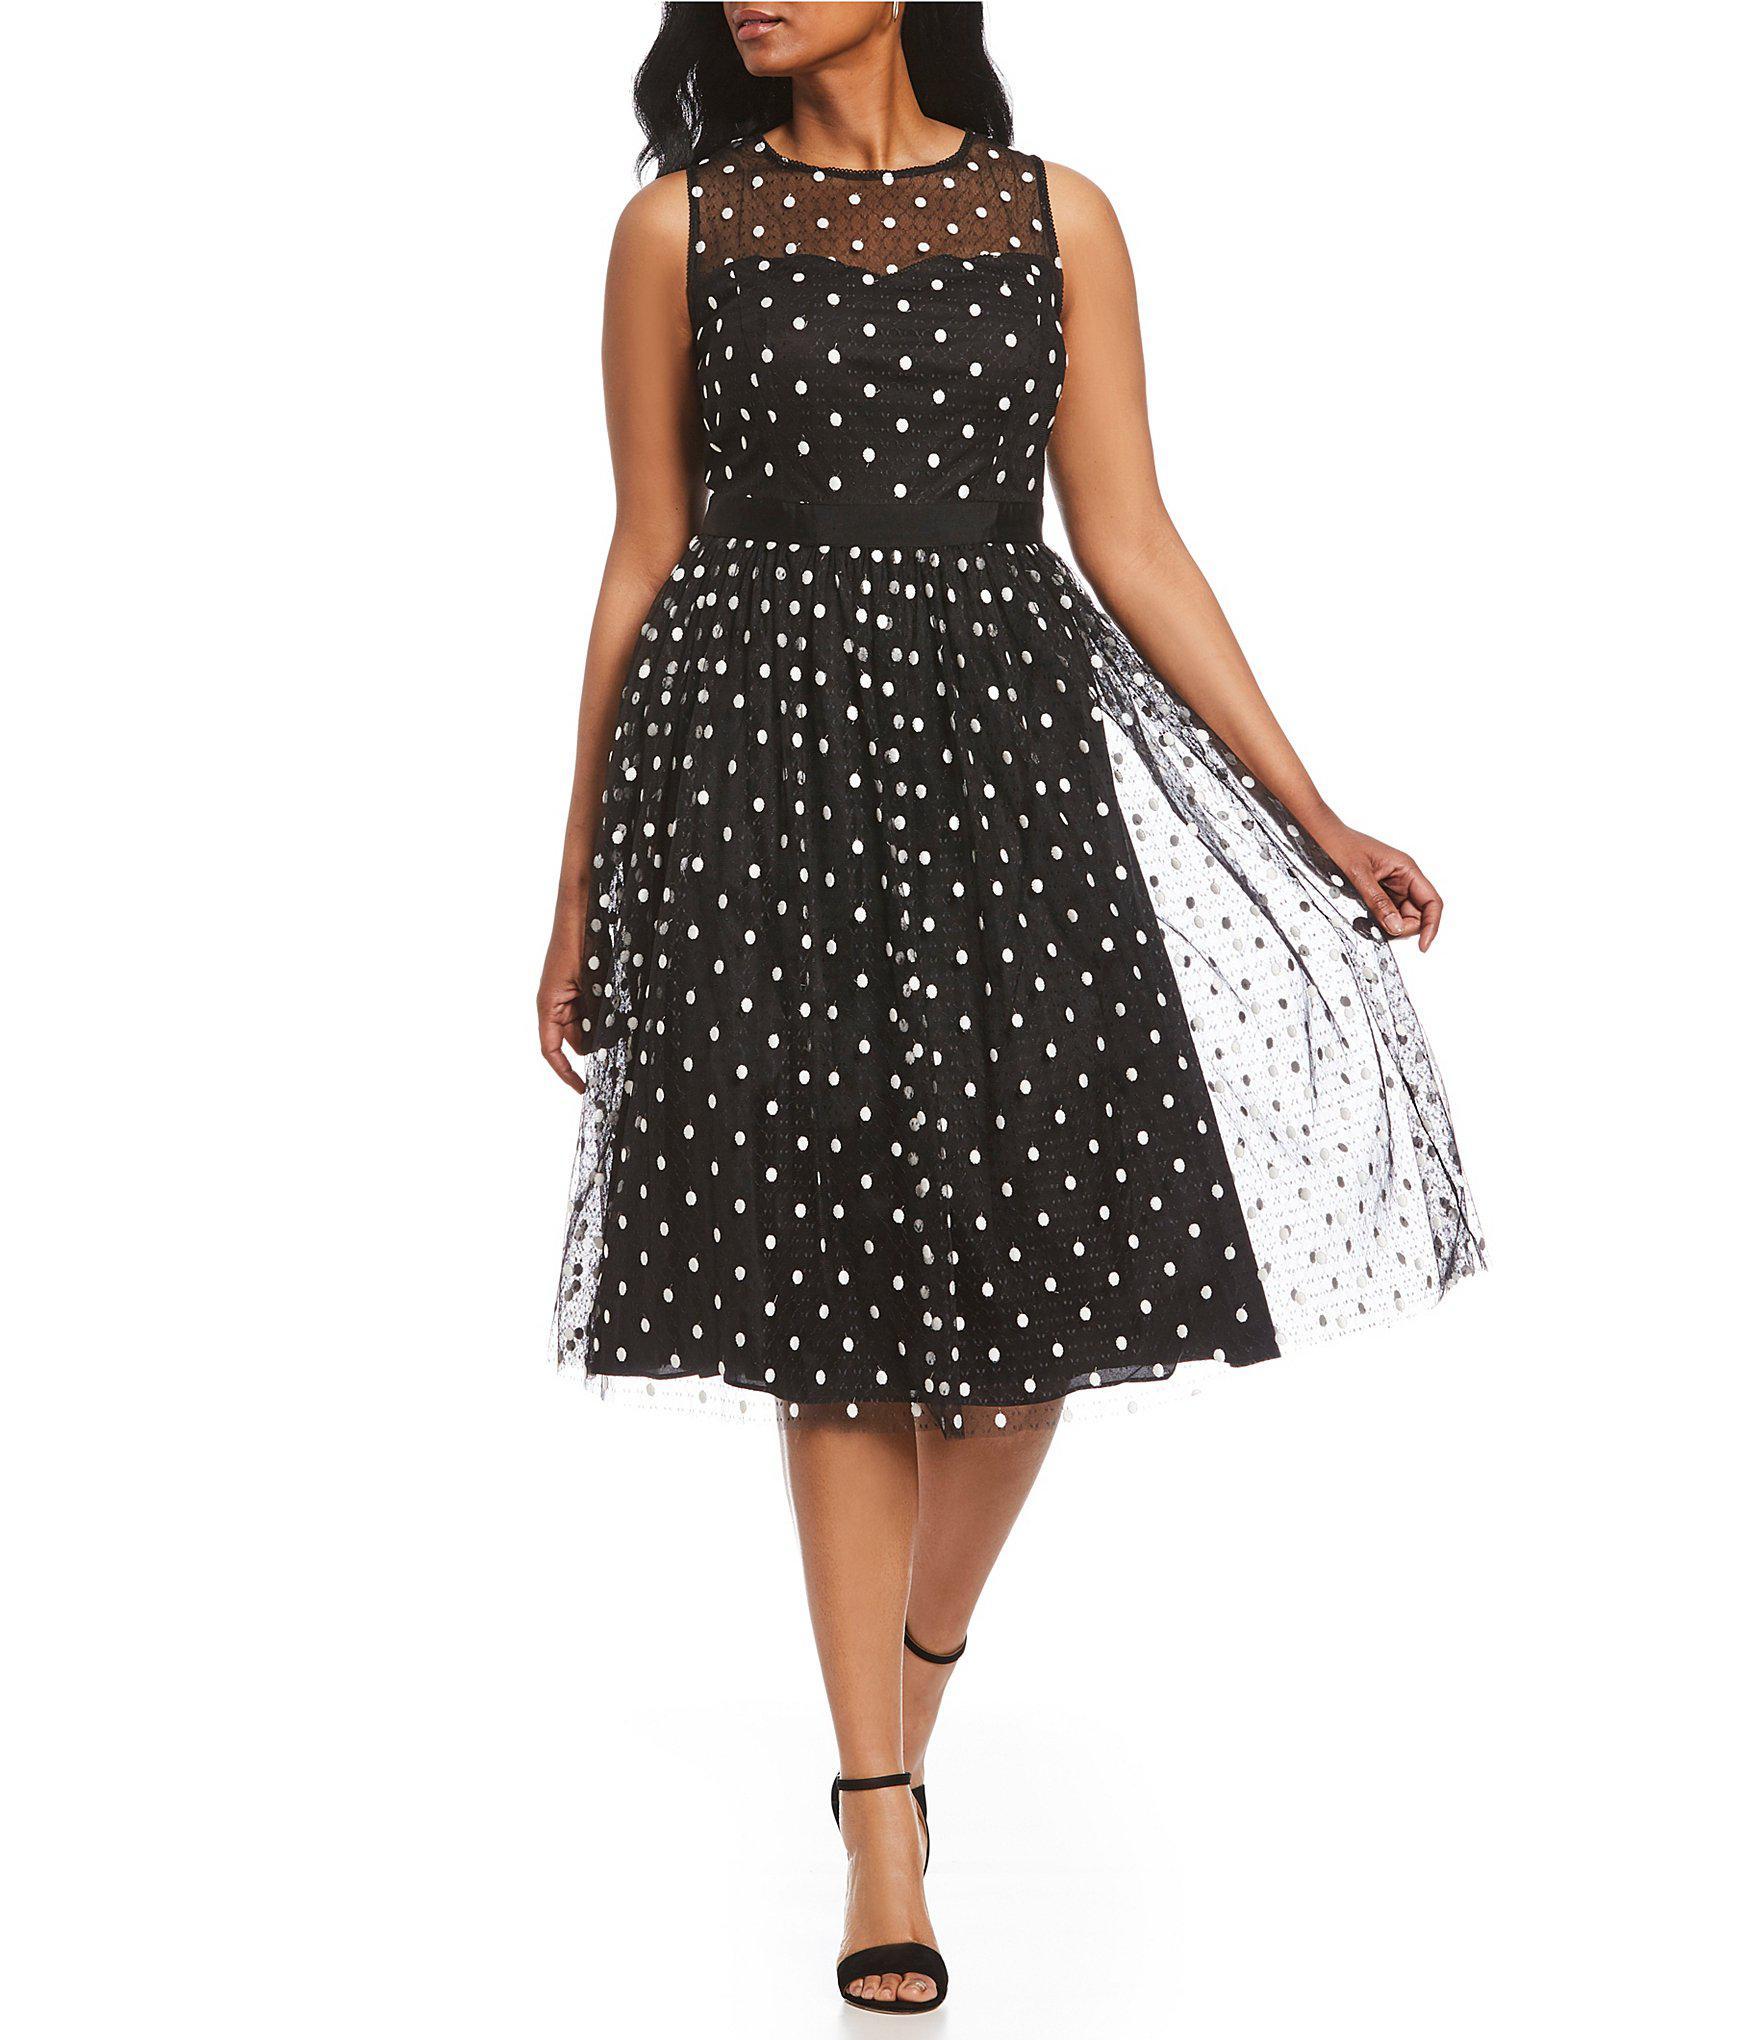 2655bb969b6 Gallery. Previously sold at  Dillard s · Women s Polka Dot Dresses Women s Tea  Dresses